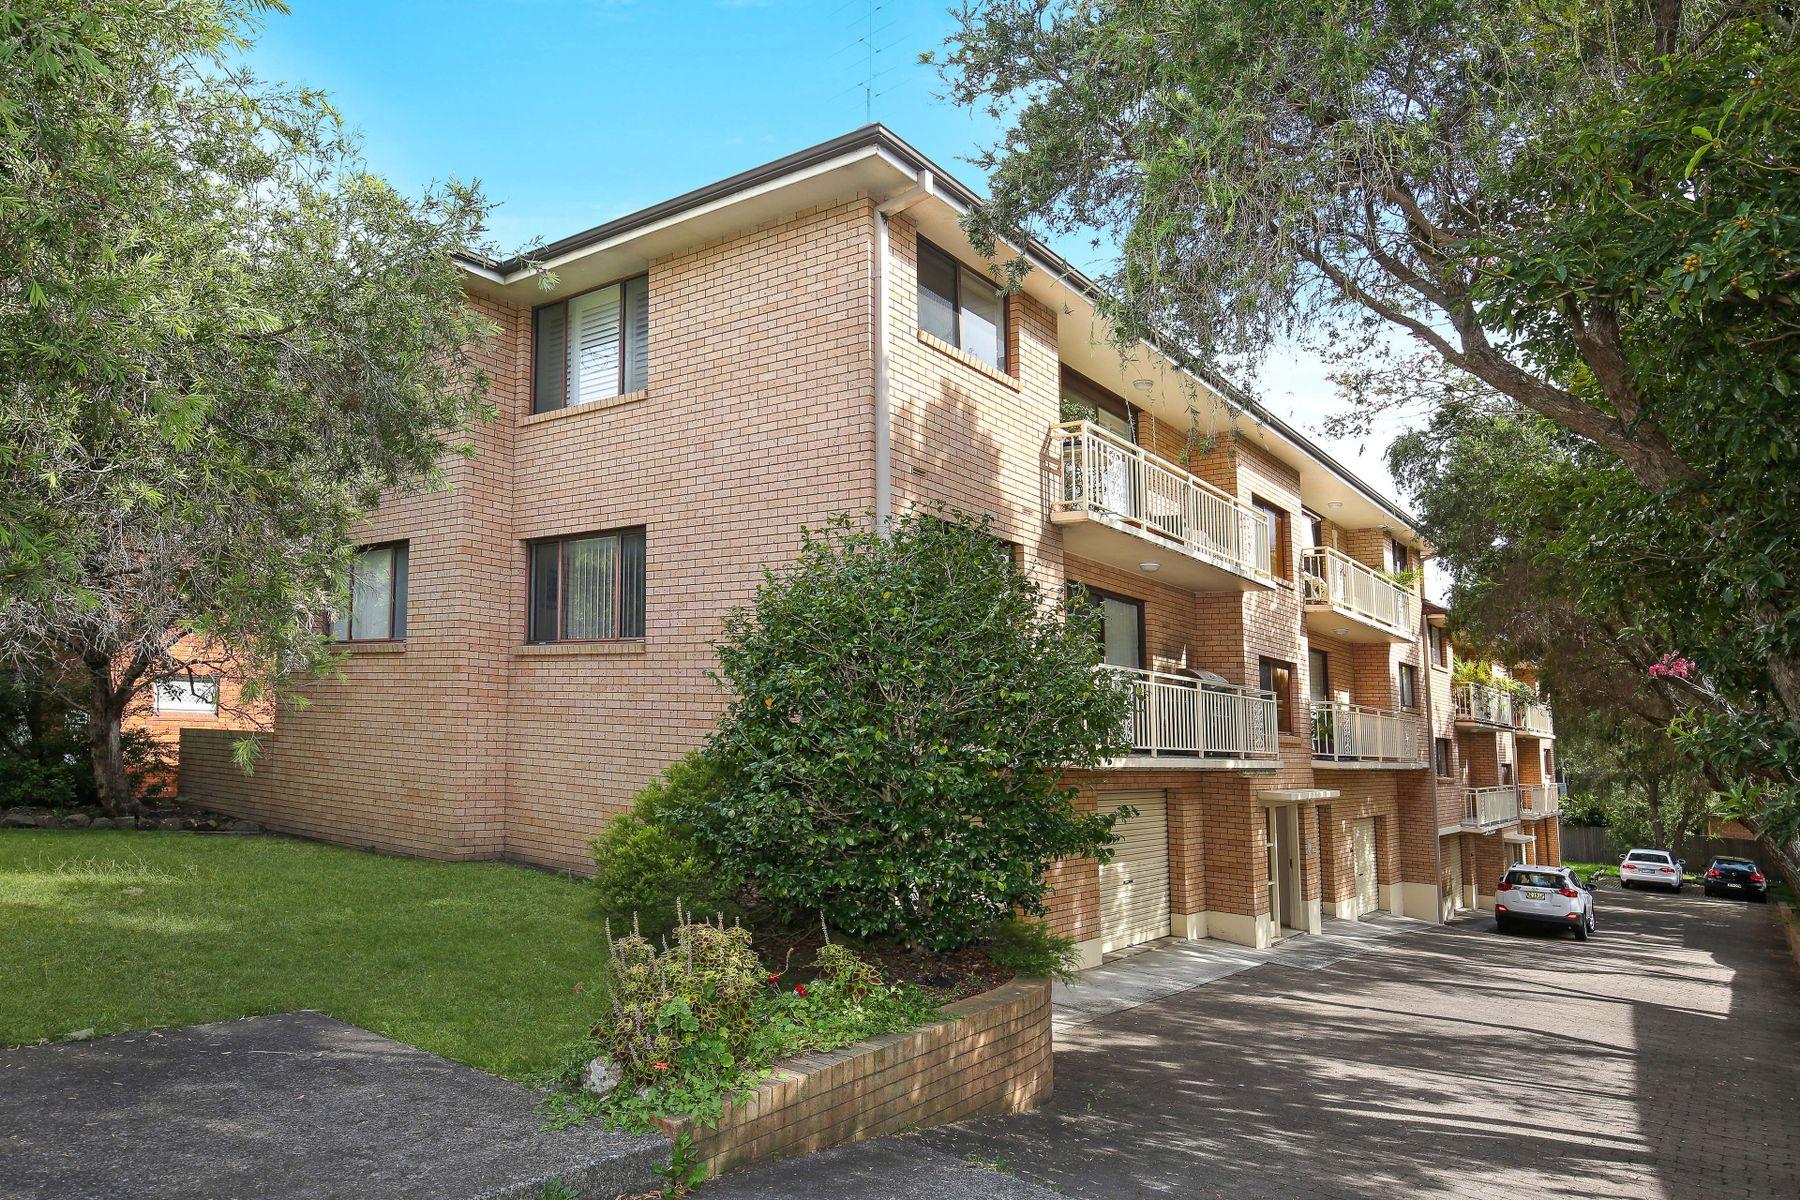 3/18 Smith Street, Wollongong, NSW 2500